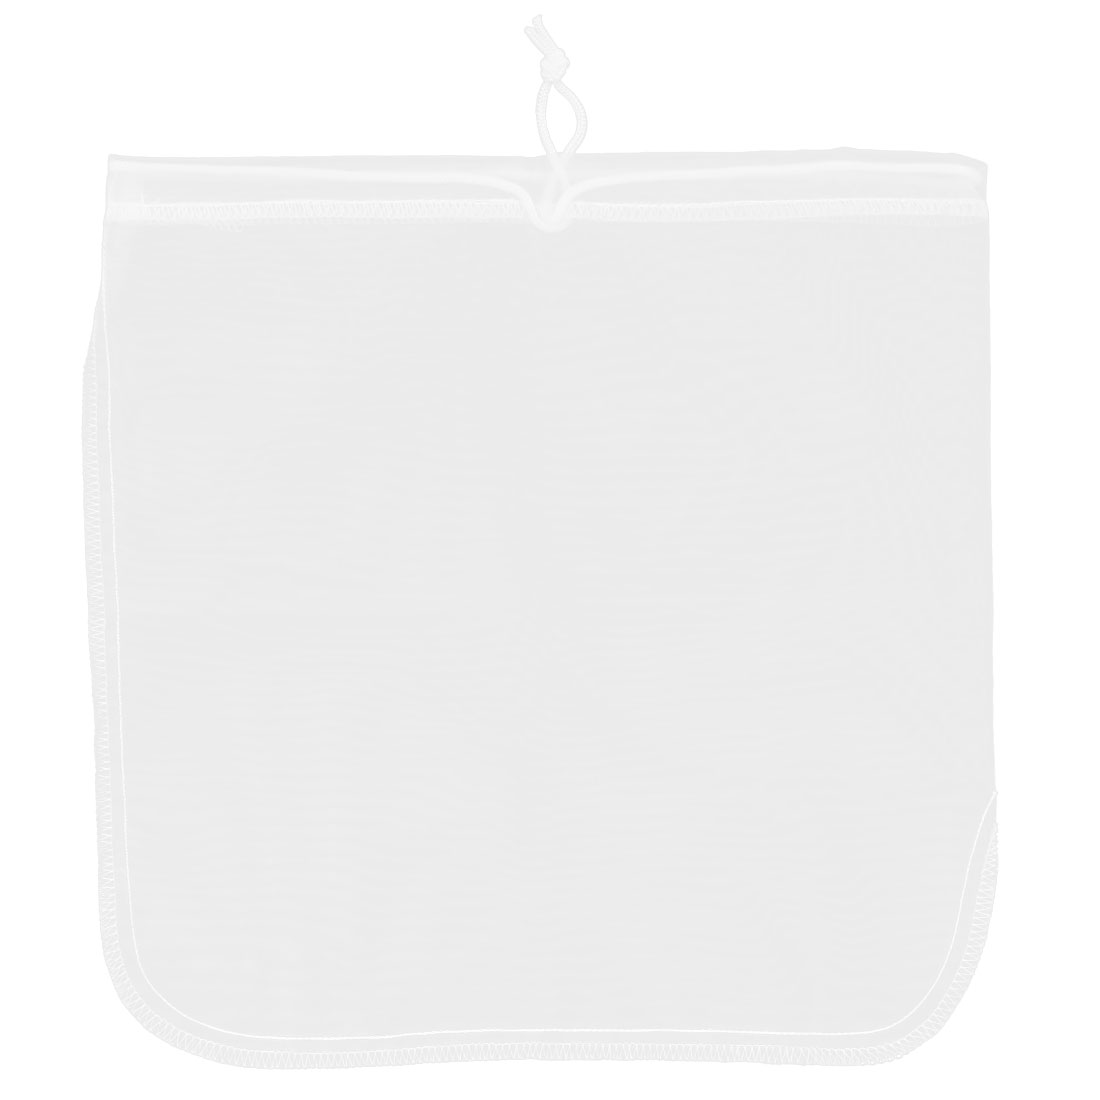 Reusable Nut Milk Tea Fruit Juice Fine Nylon Mesh Strain Filter Bag